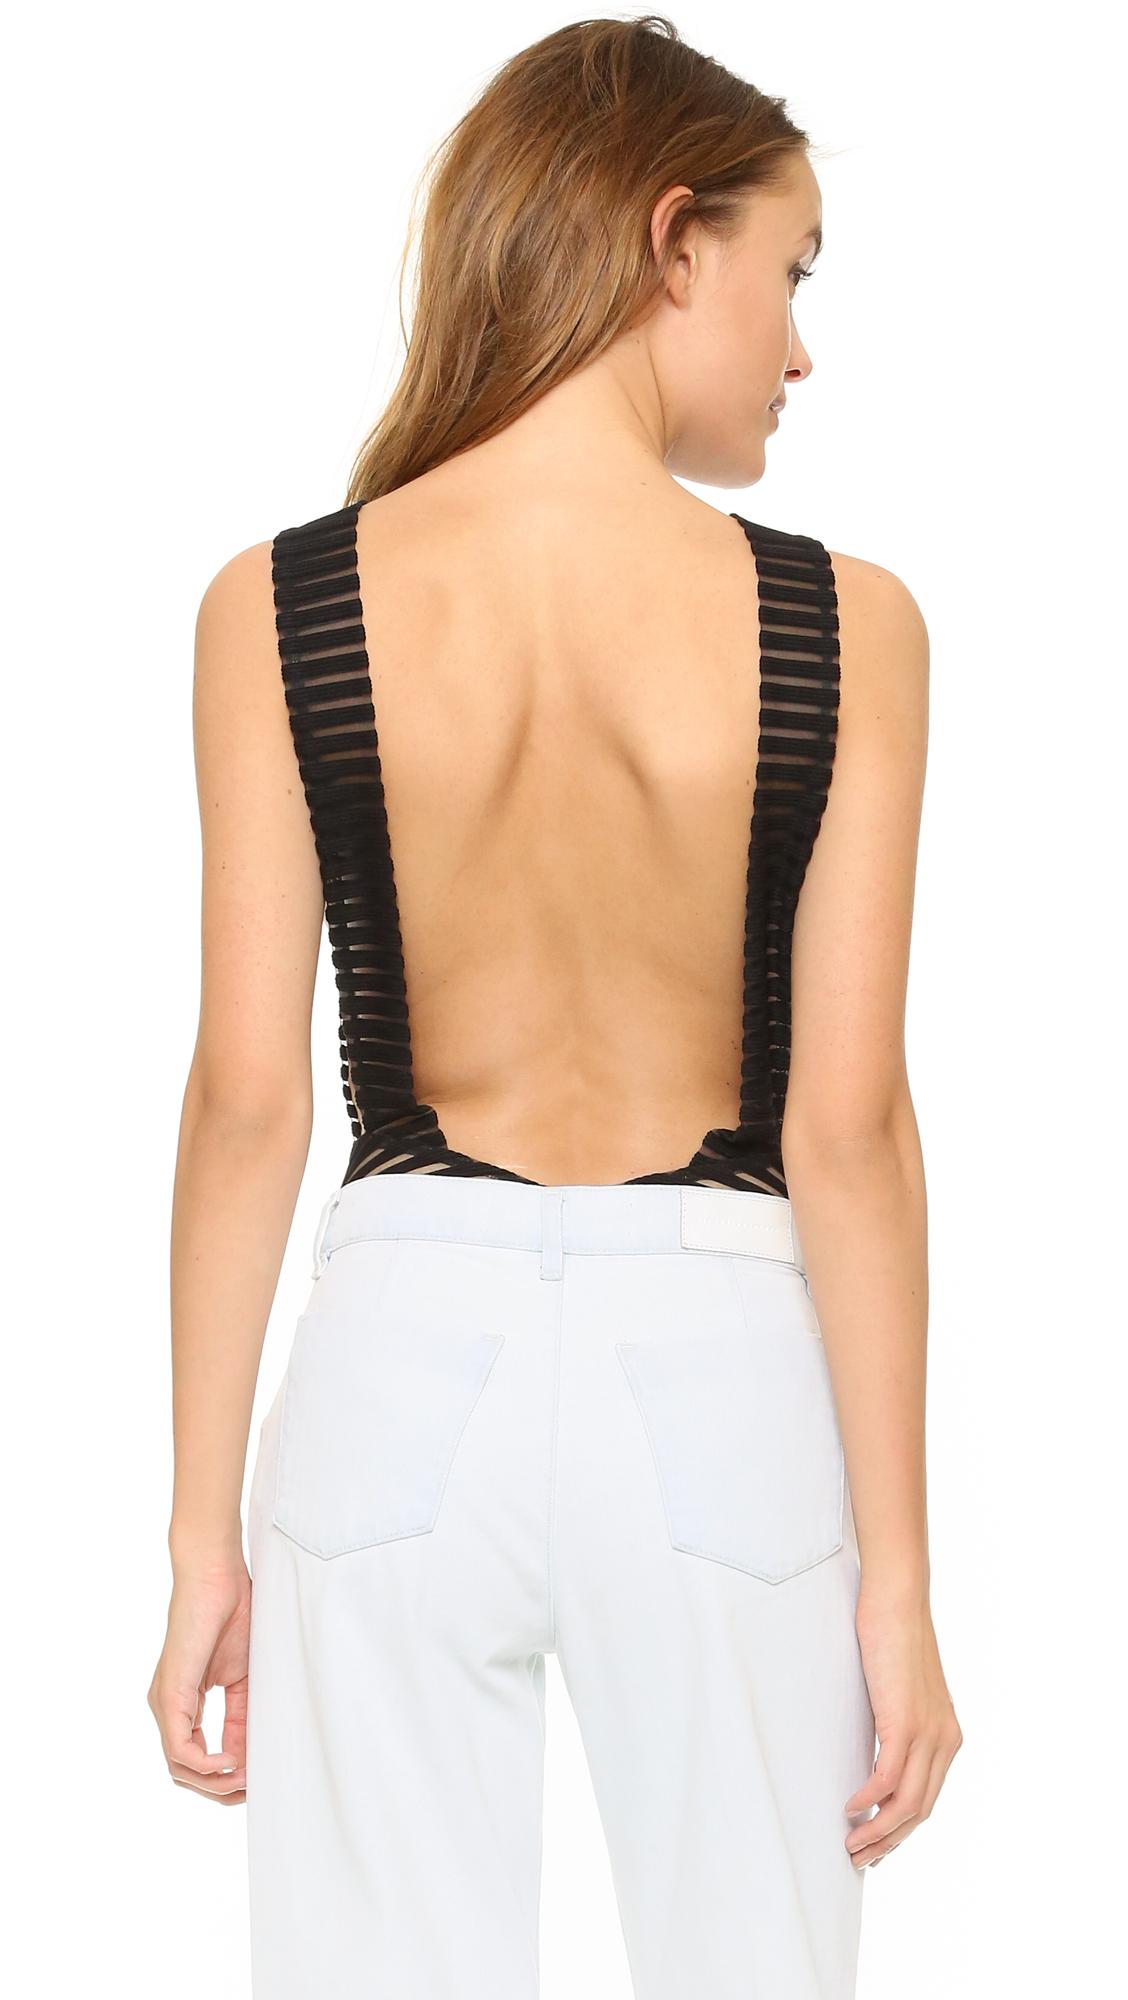 Aq/aq Sydney Backless Bodysuit with Plunge Neck in Black